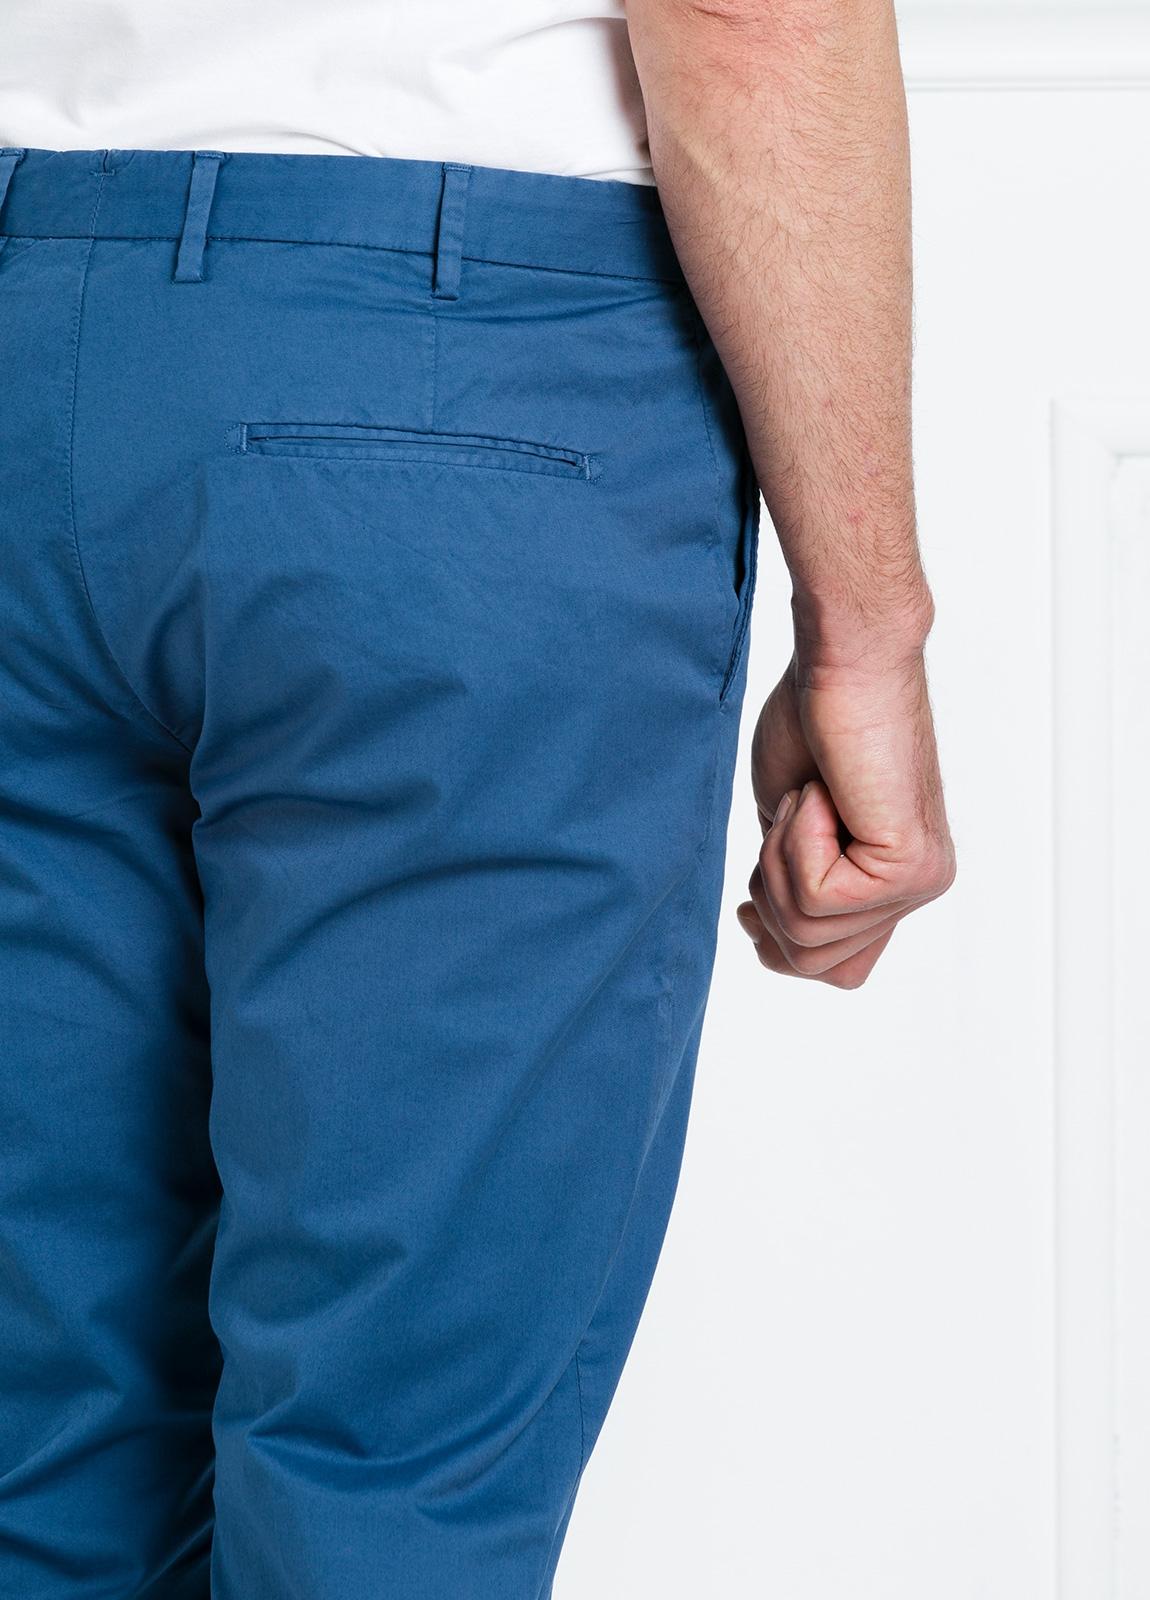 Pantalón chino REGULAR FIT modelo BRIAN color azul. 97% Algodón gabardina 3% Elastán. - Ítem3